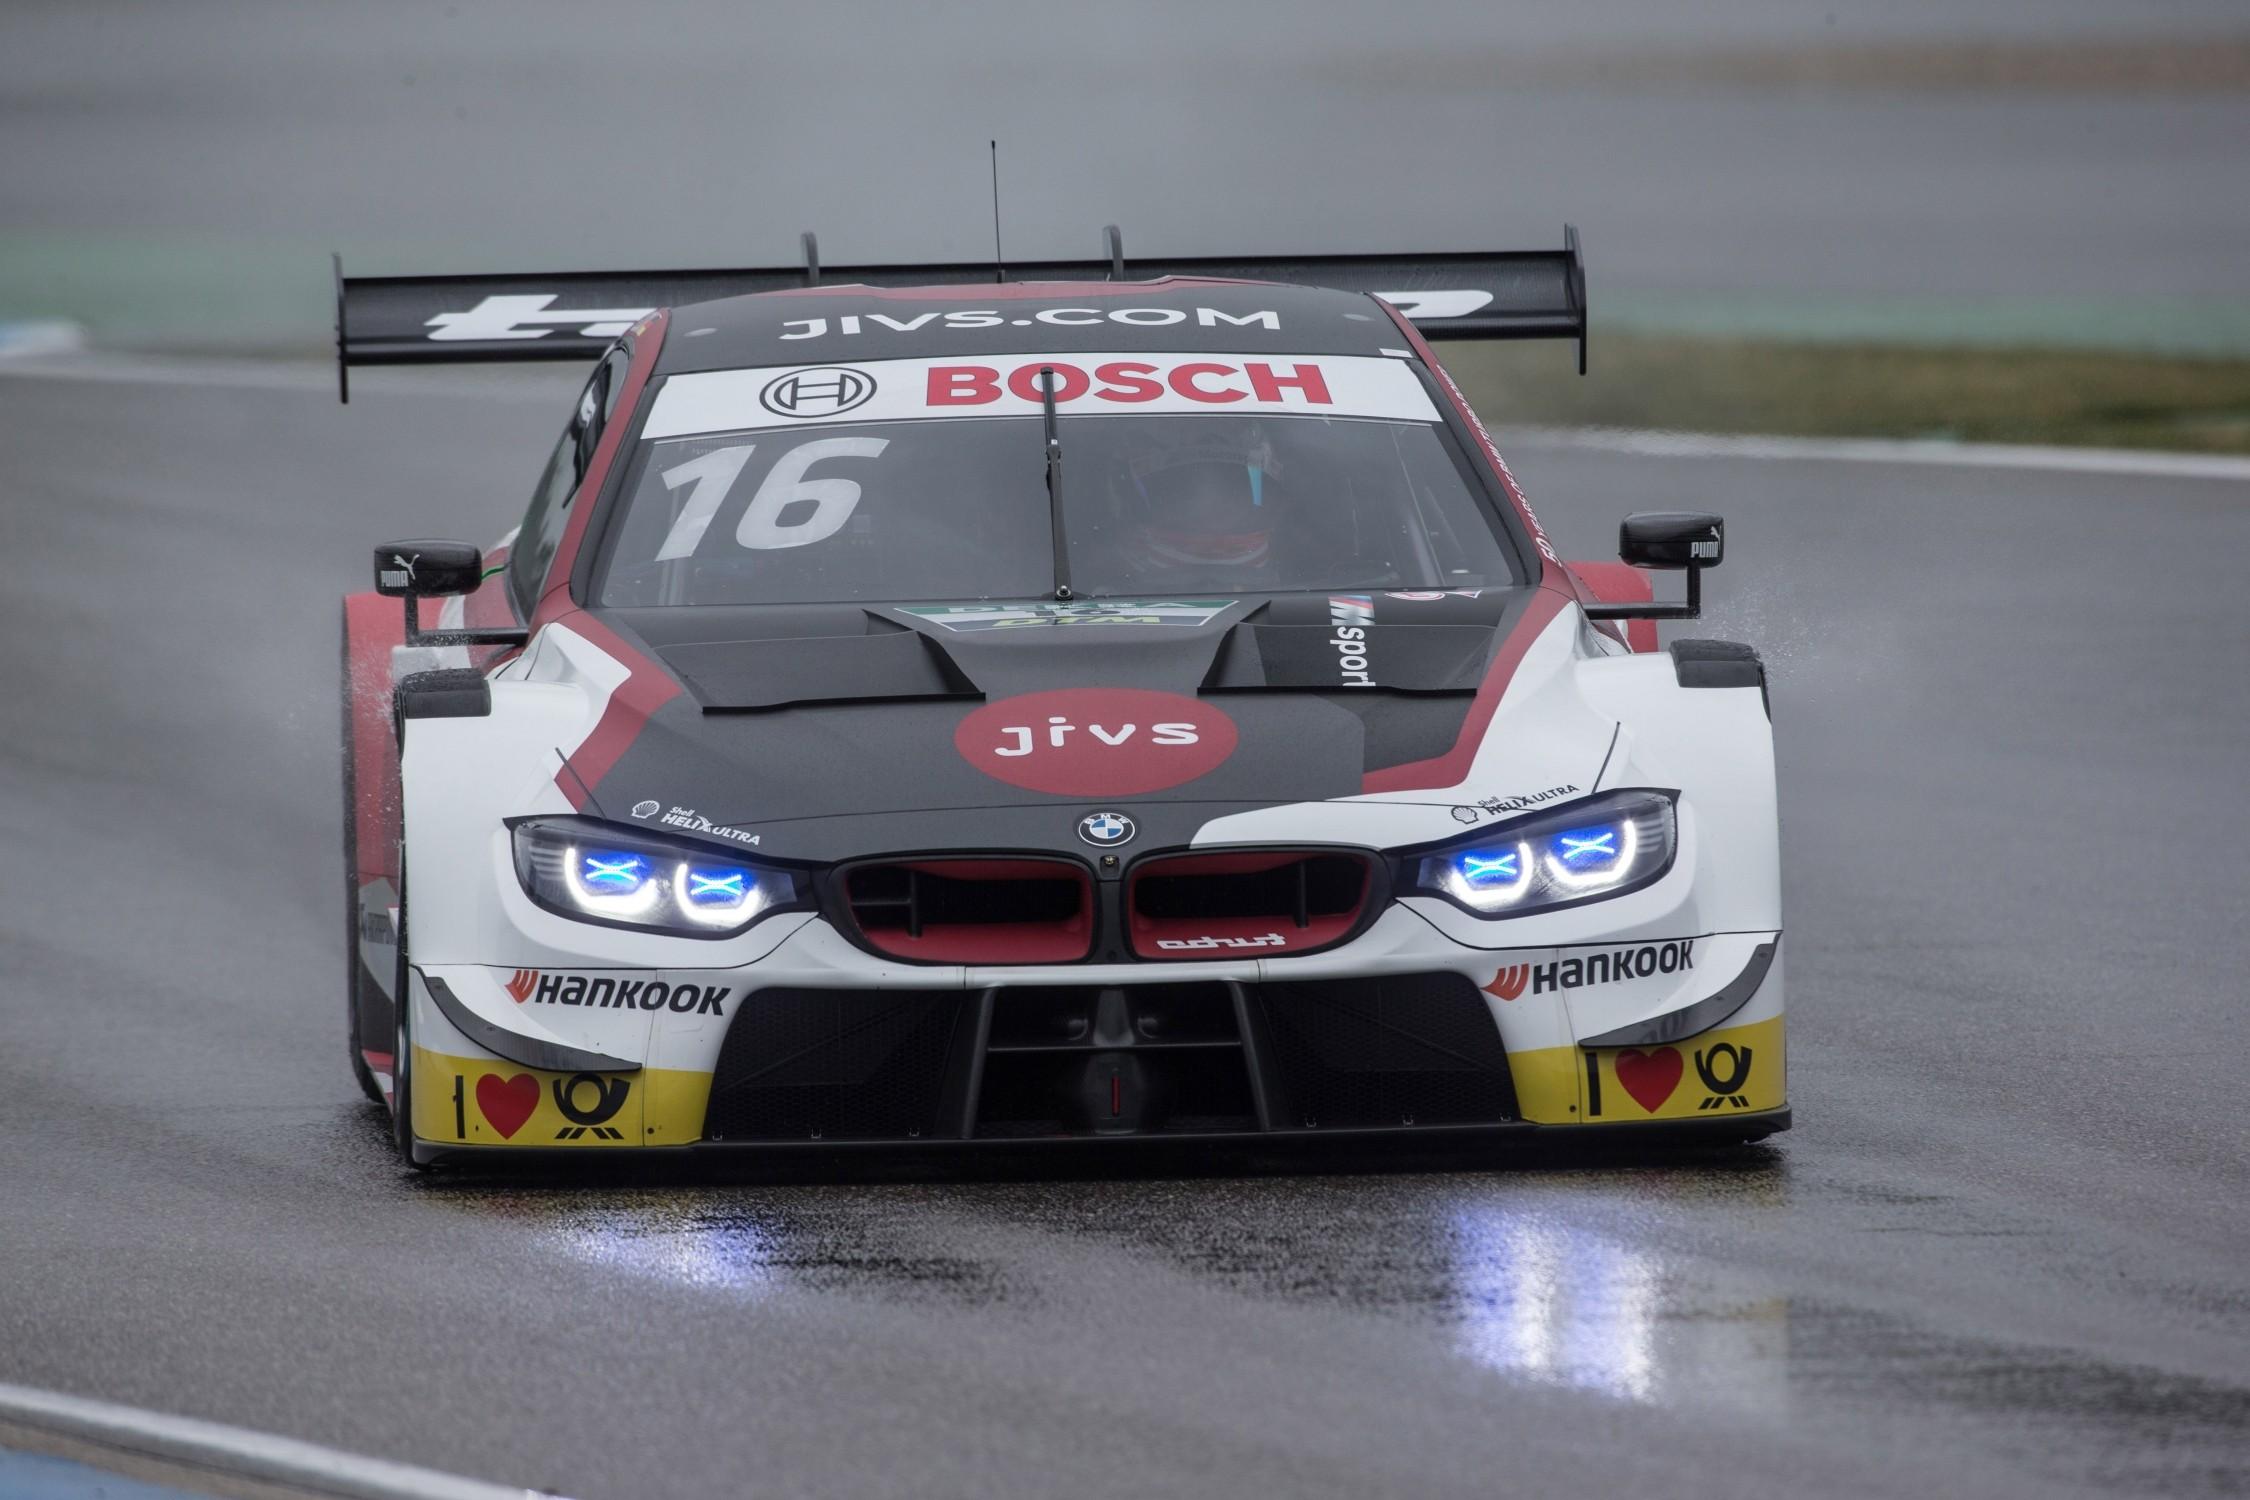 BMW M4 JIVS N°16 BMW TEAM RMG DTM HOCKENHEIM 2019